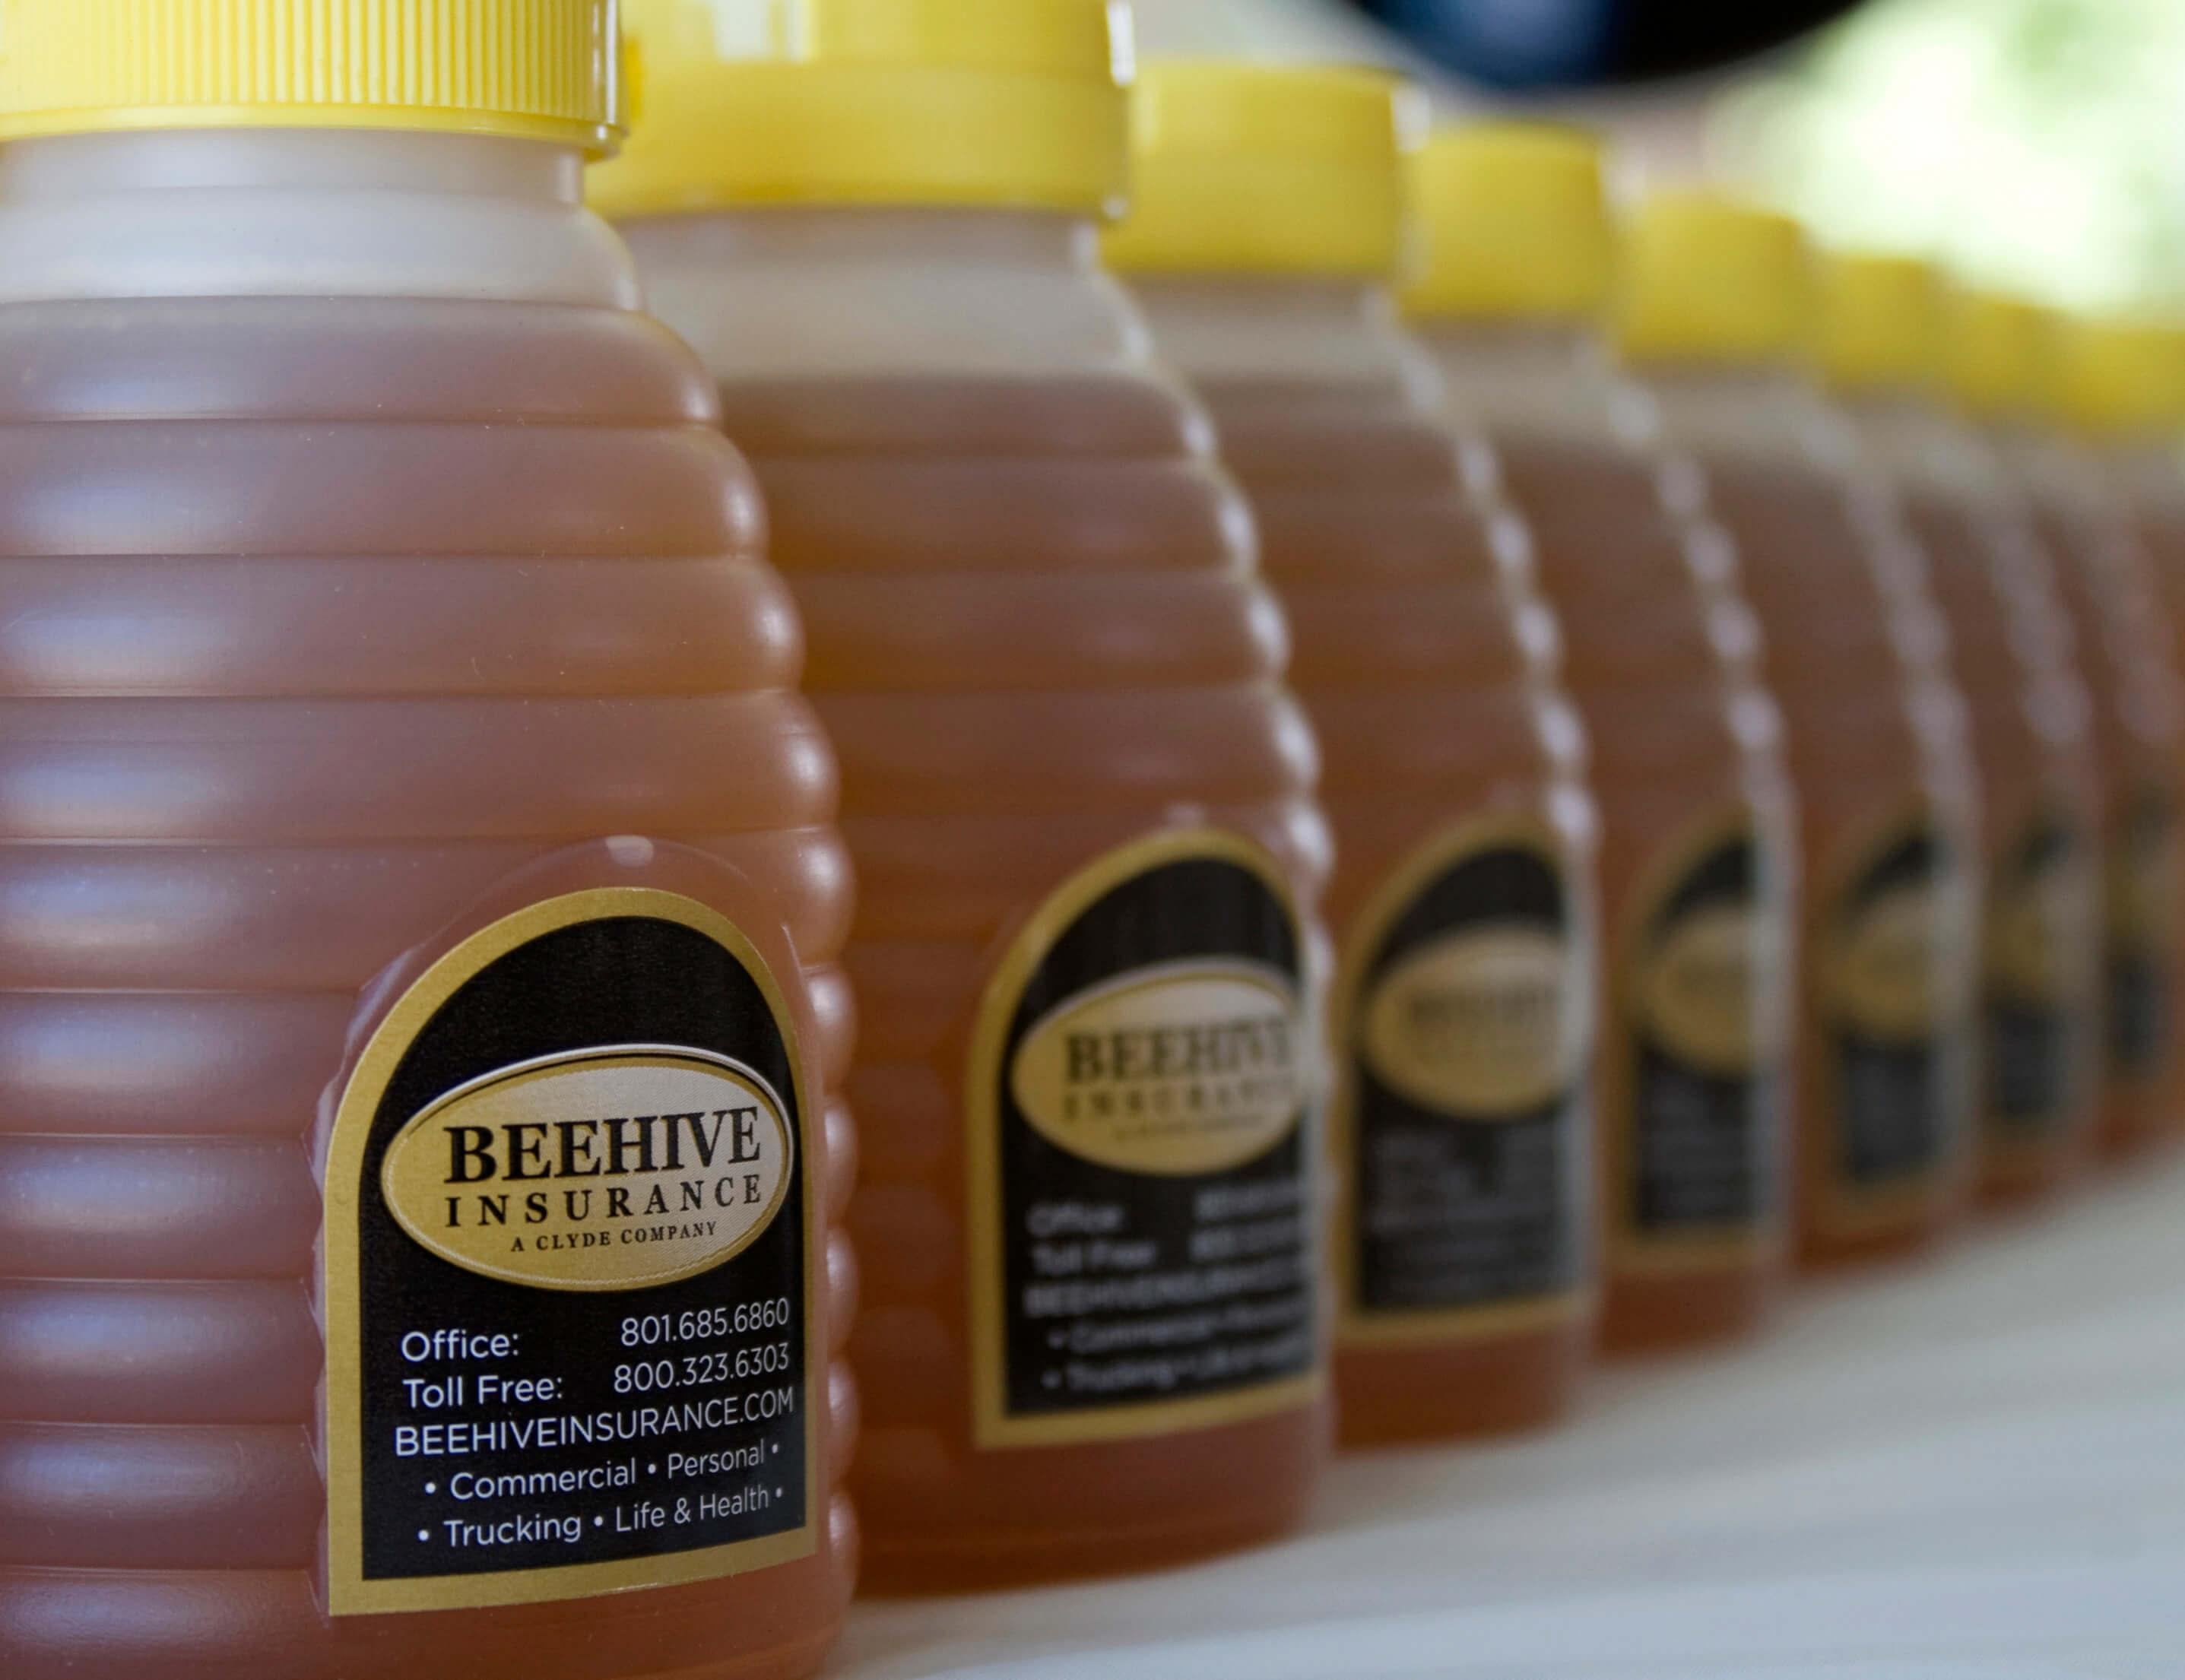 Beehive Honey Beehive Insurance